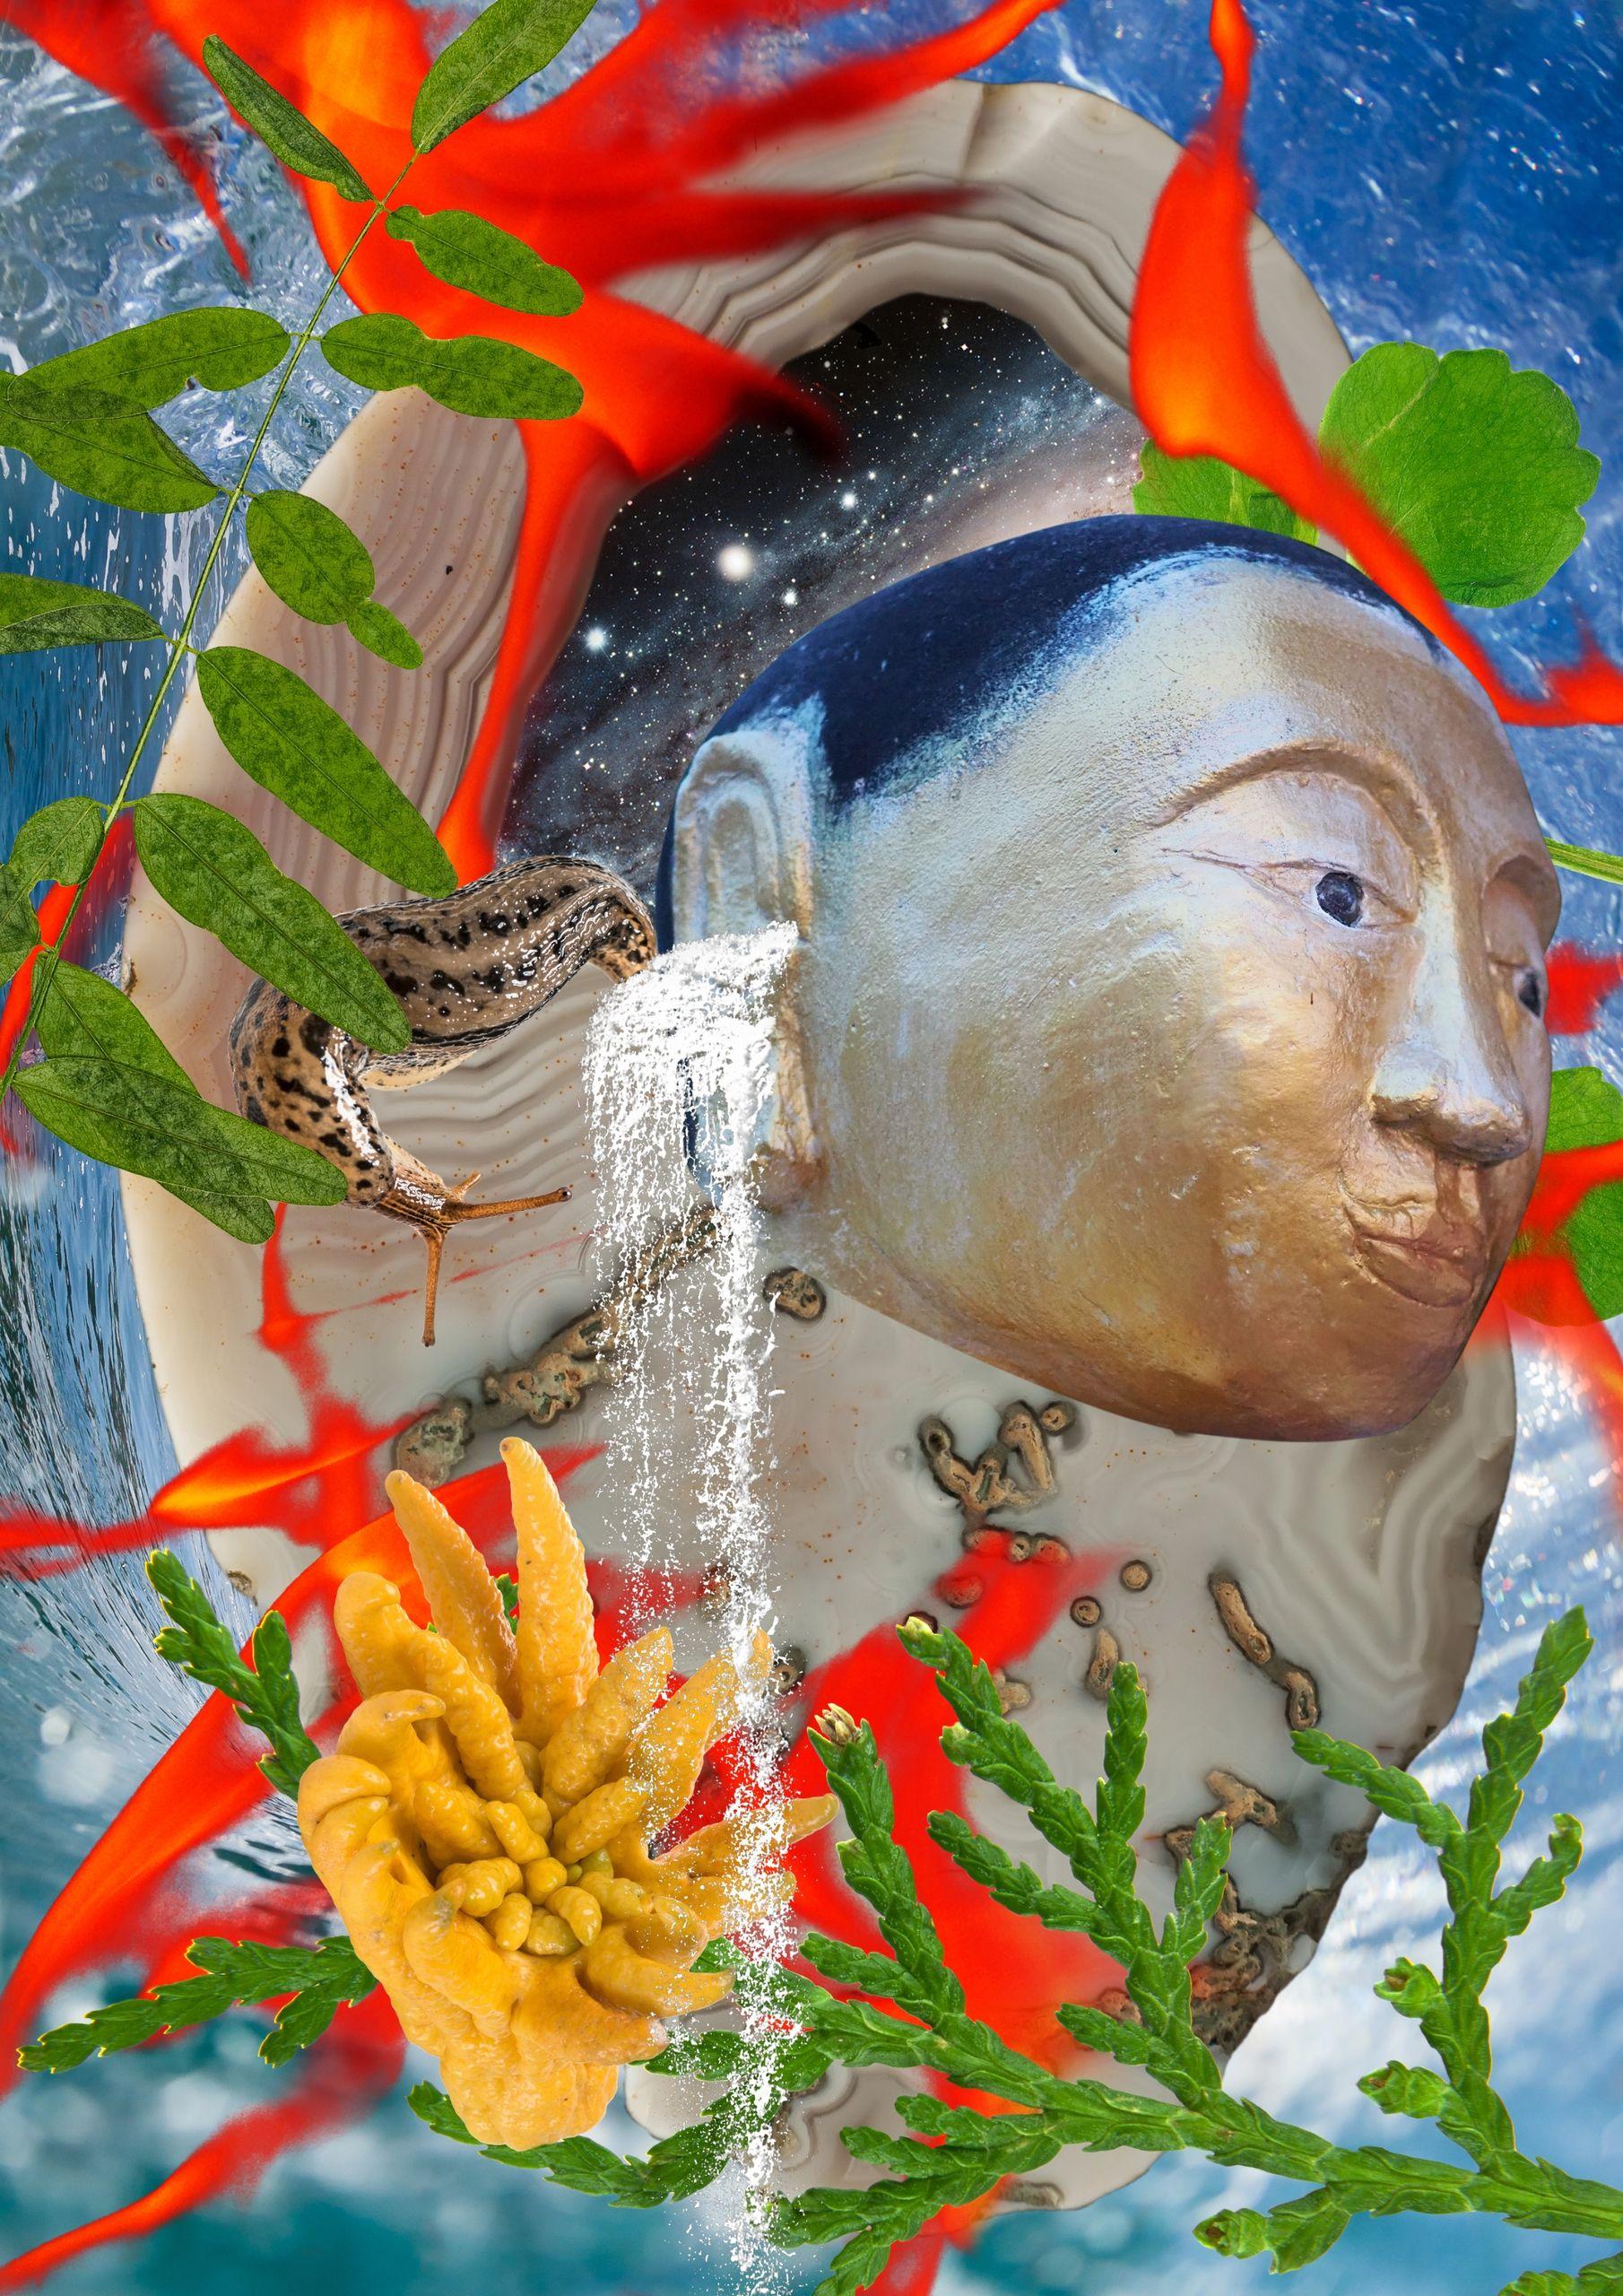 Nature+Emotion42 #meditation #mindfulness #